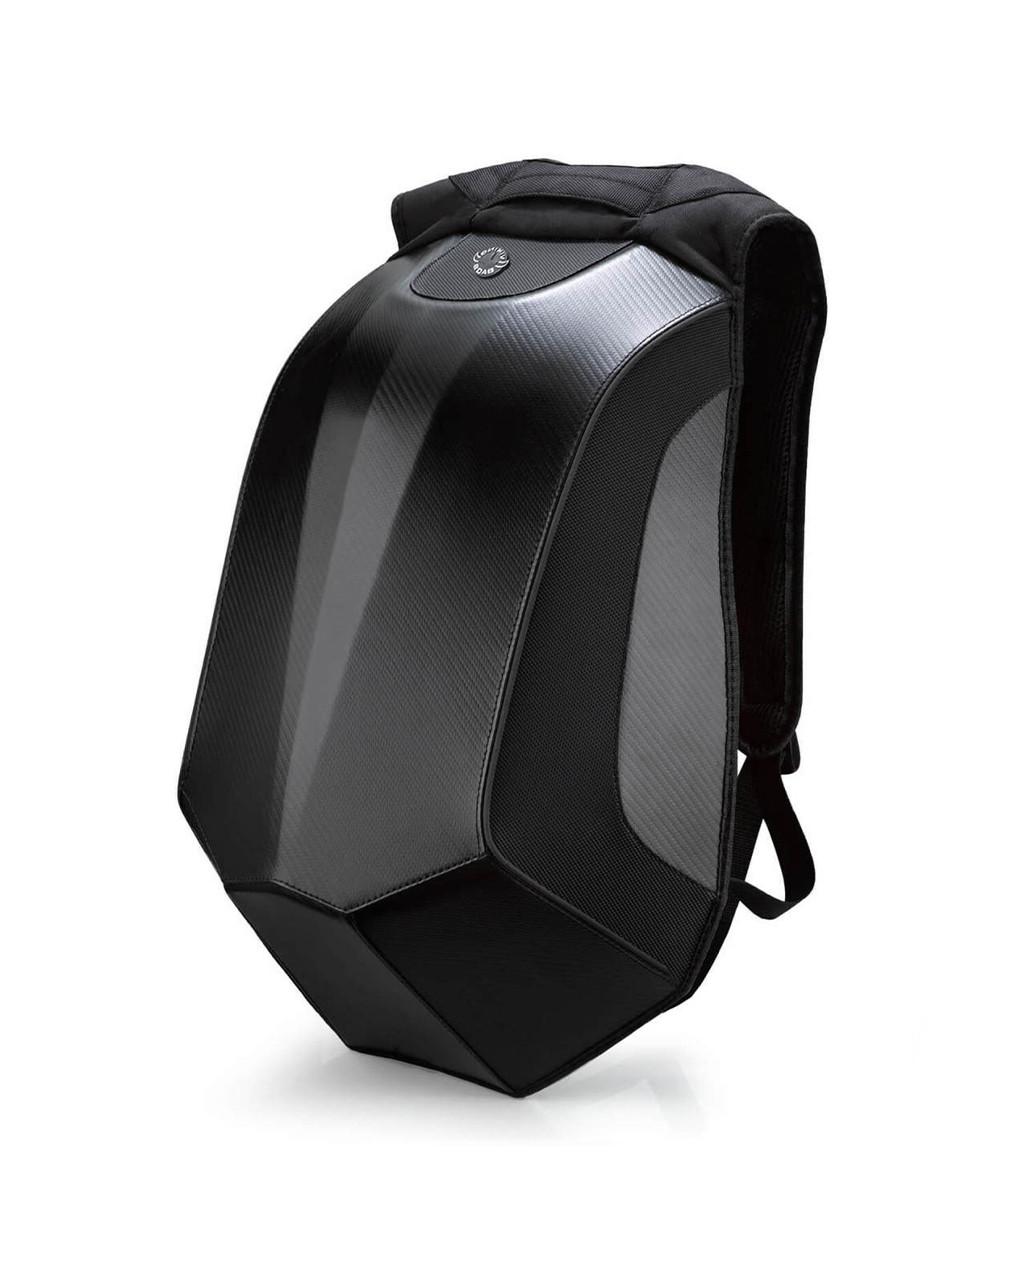 VikingBags Velocity Large Black Expandable Motorcycle Backpack For Harley Davidson Main Bag View